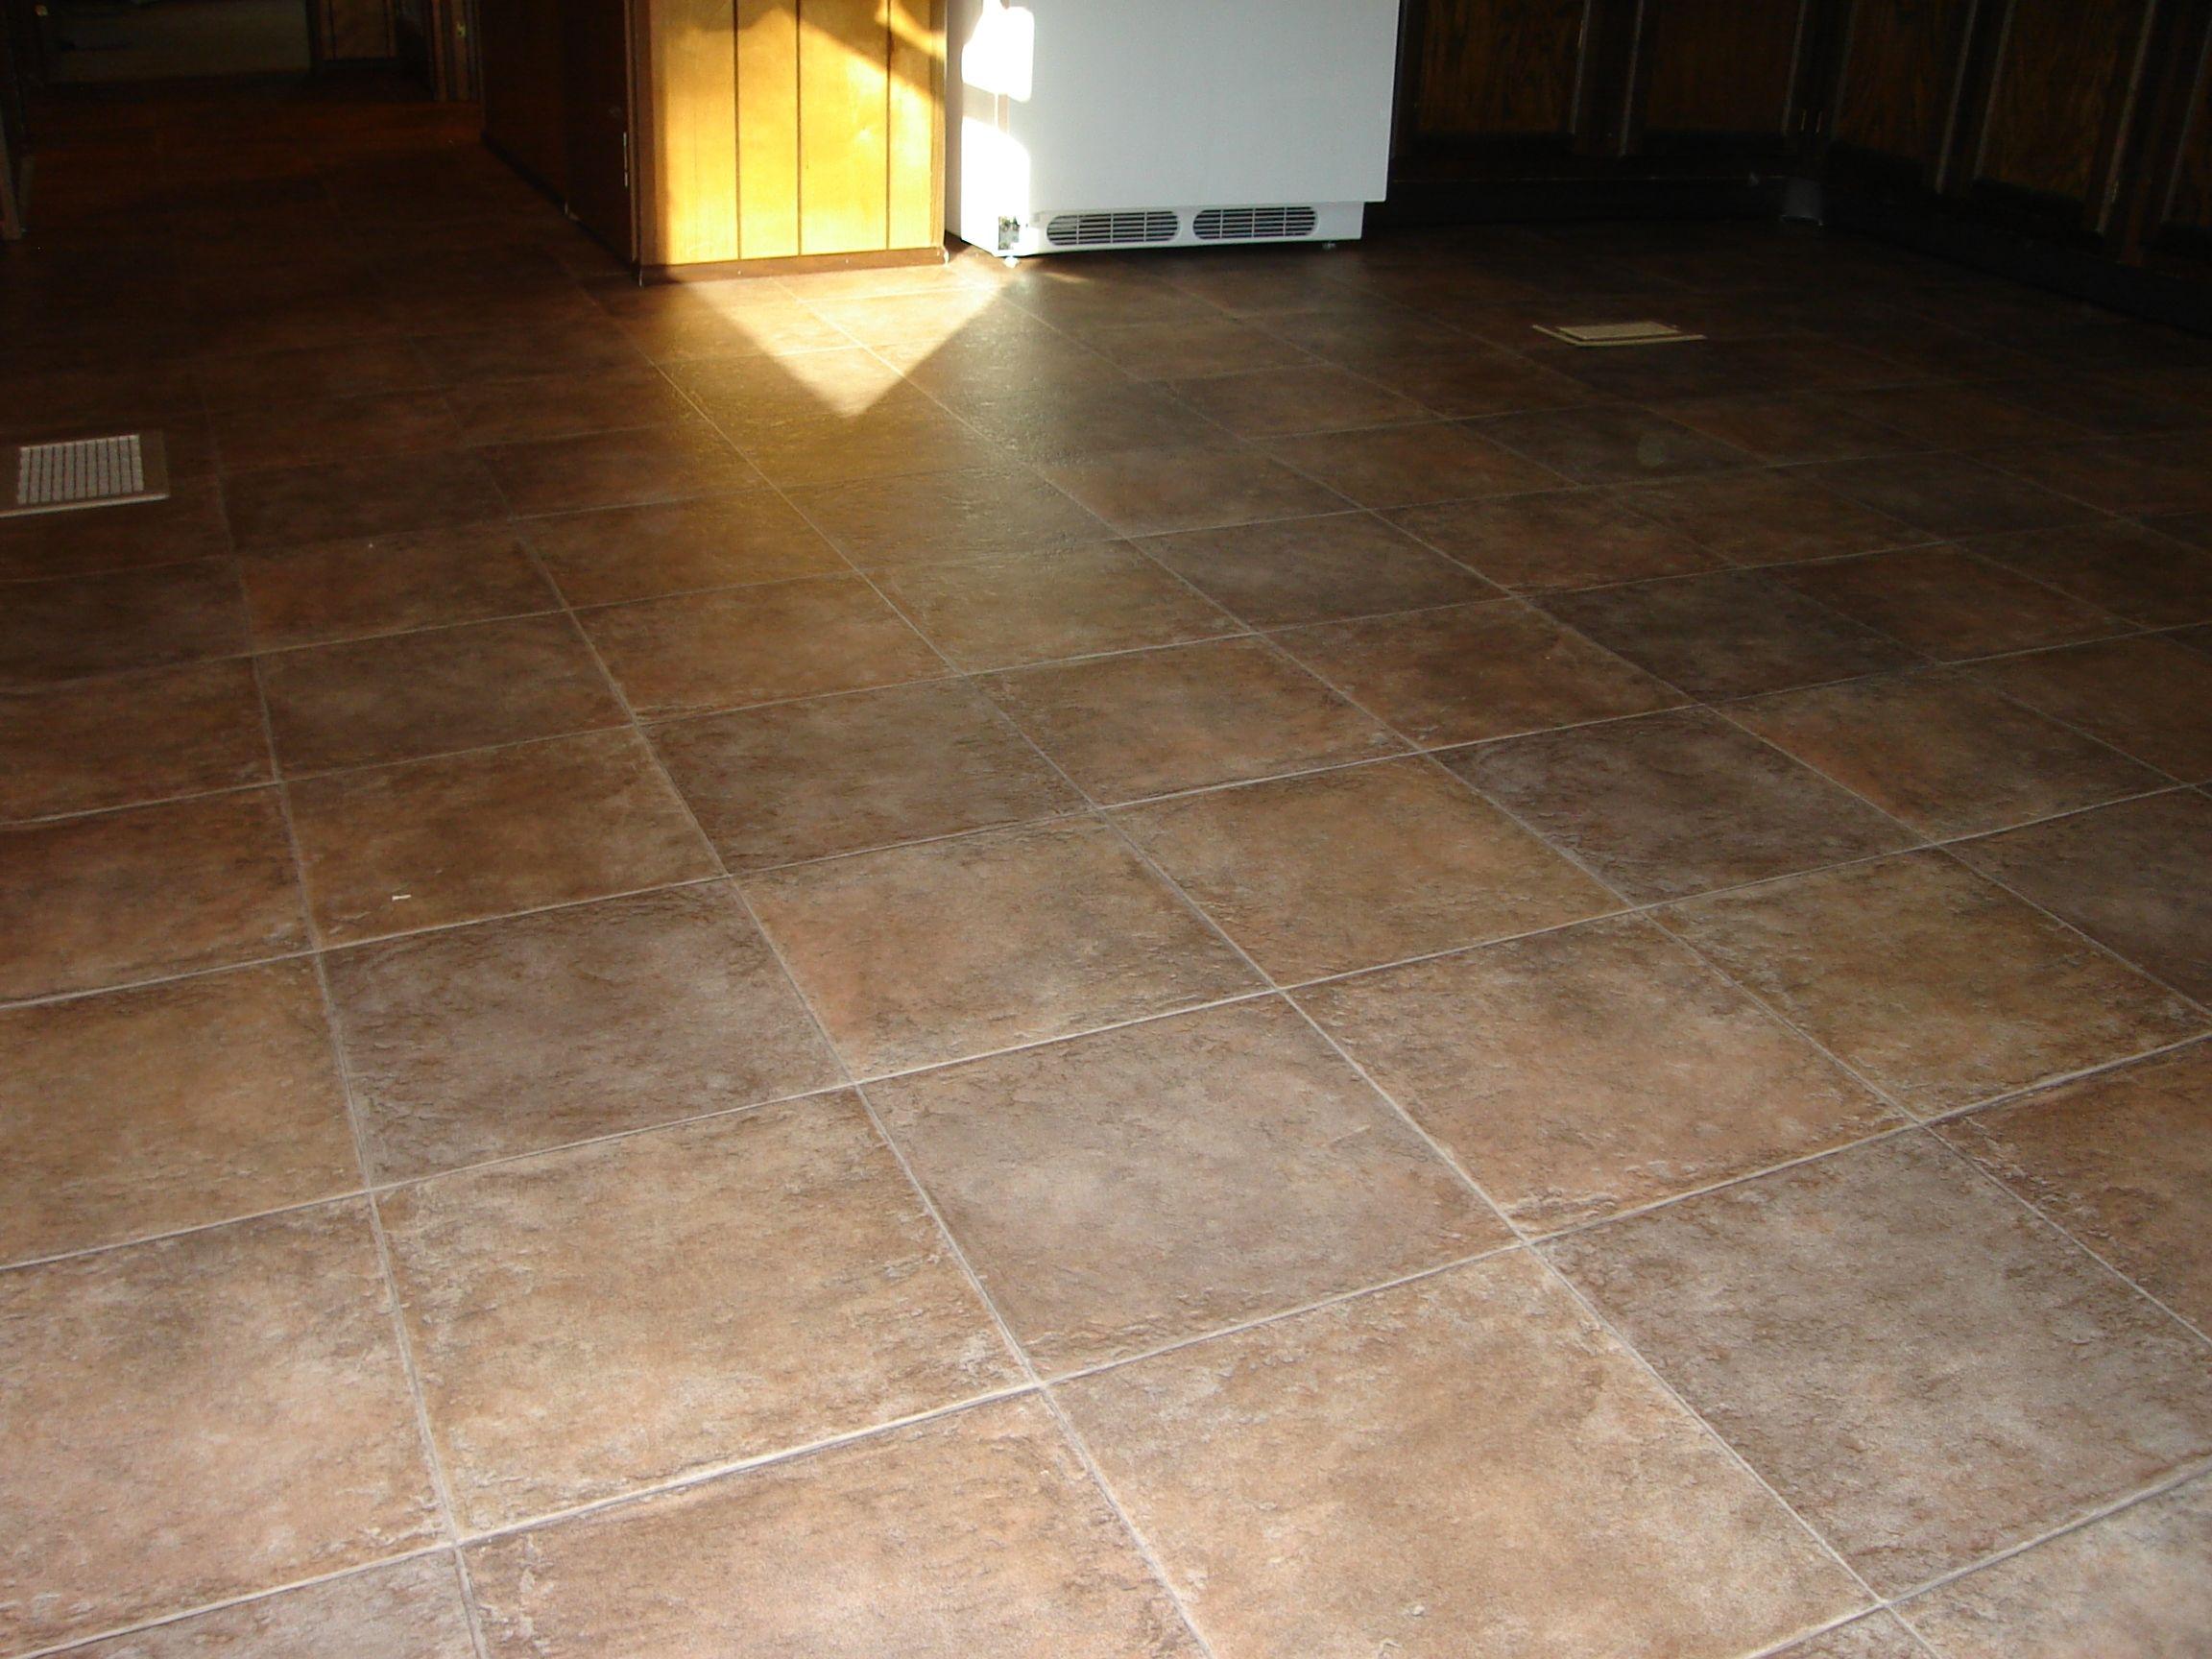 Interlocking Vinyl Floor Tiles Kitchen | Interlocking vinyl ...